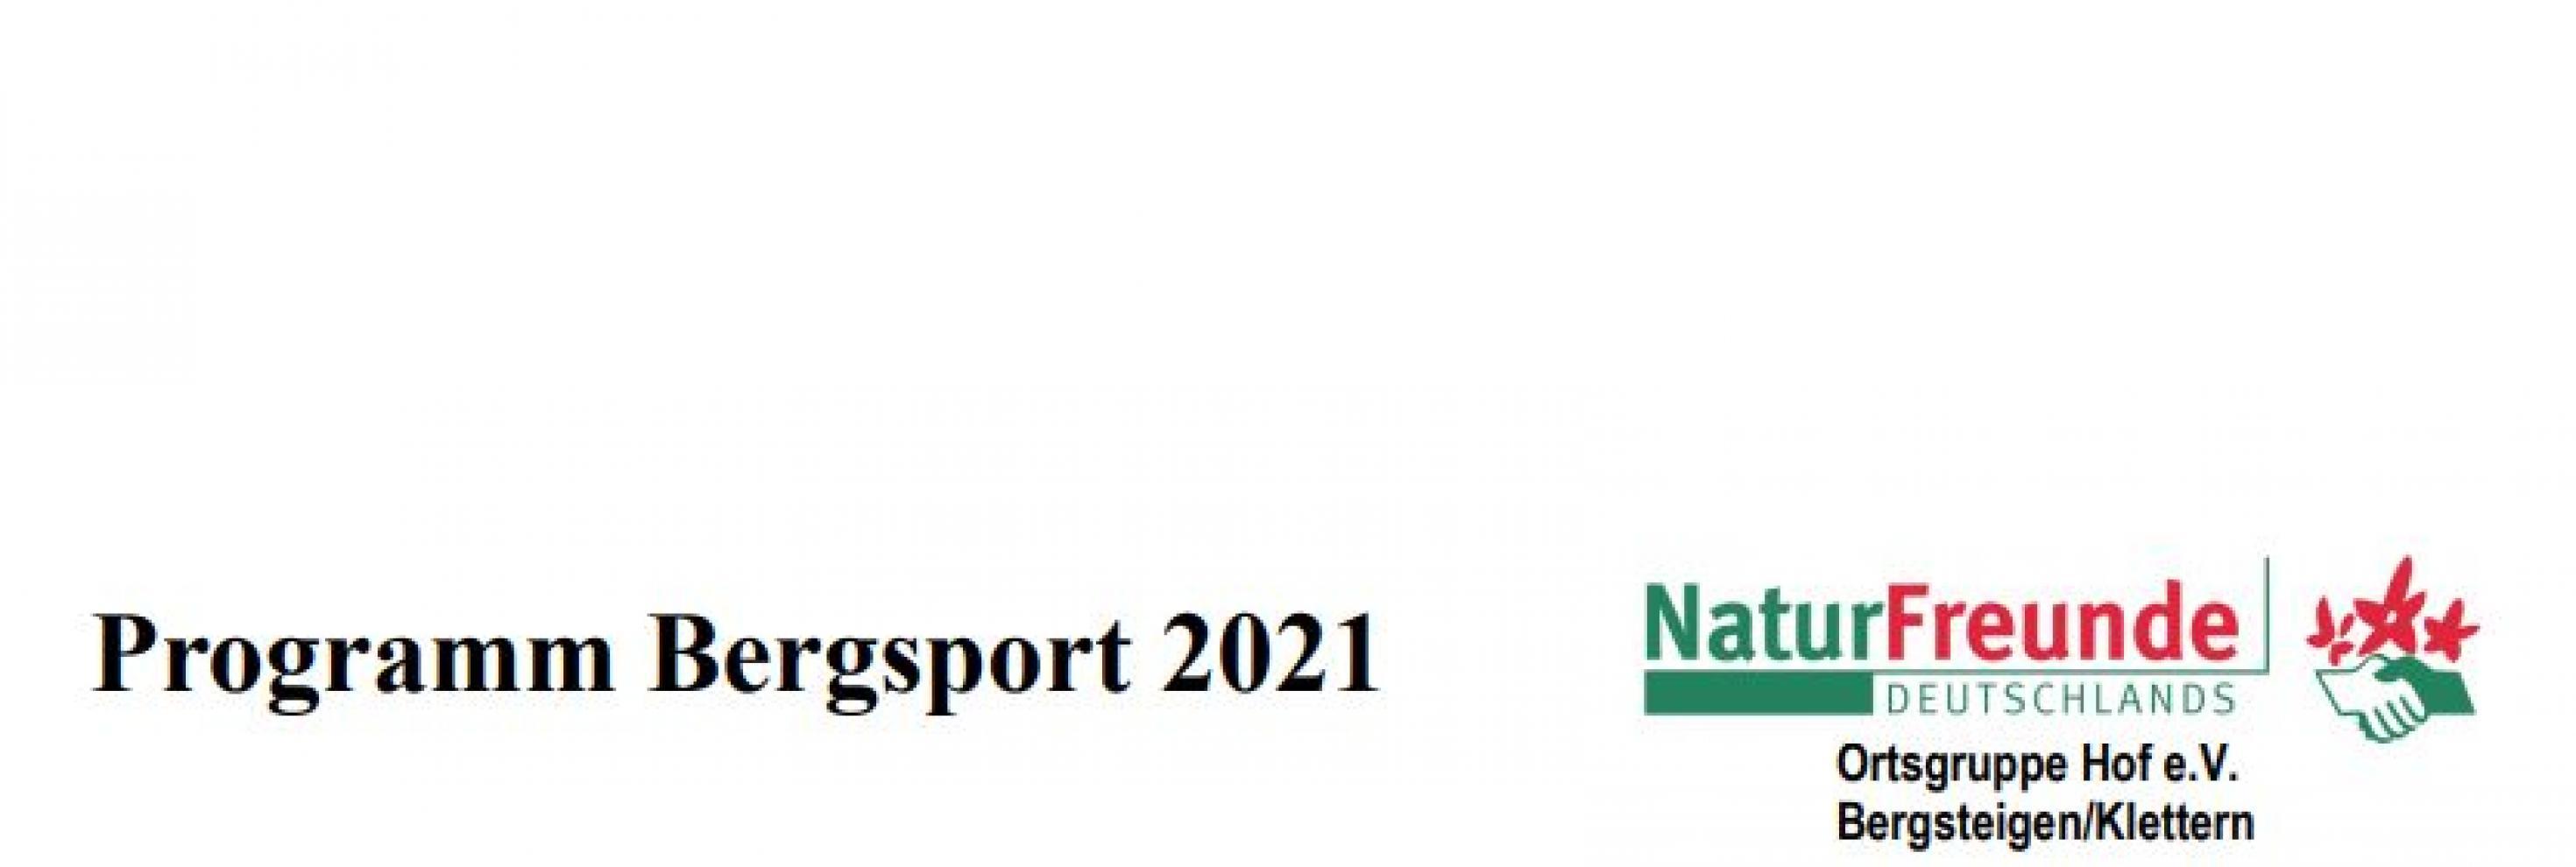 Bergsport 2021